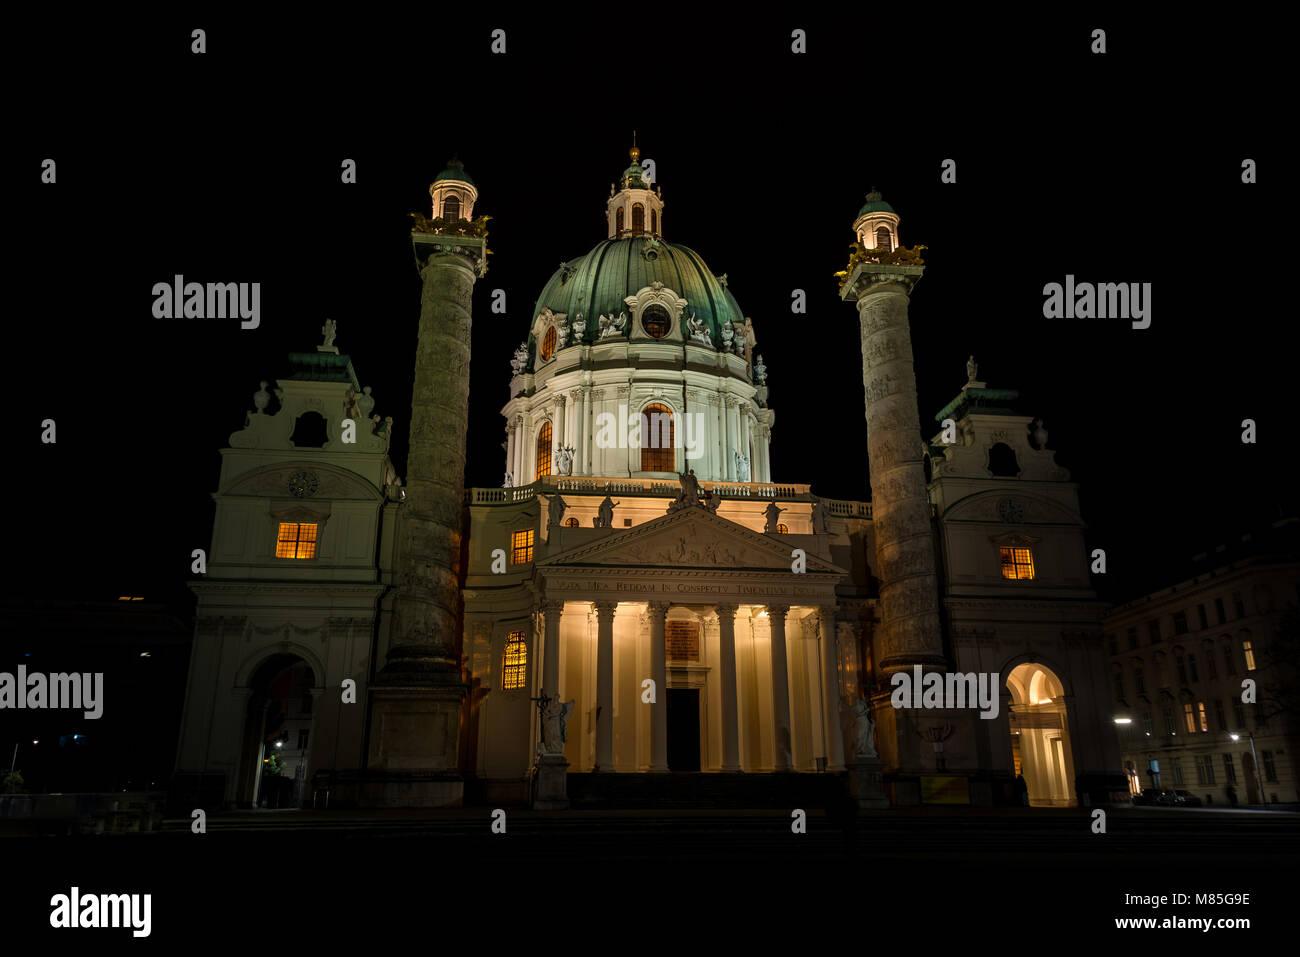 Karlskirche bei Nacht - Stock Image